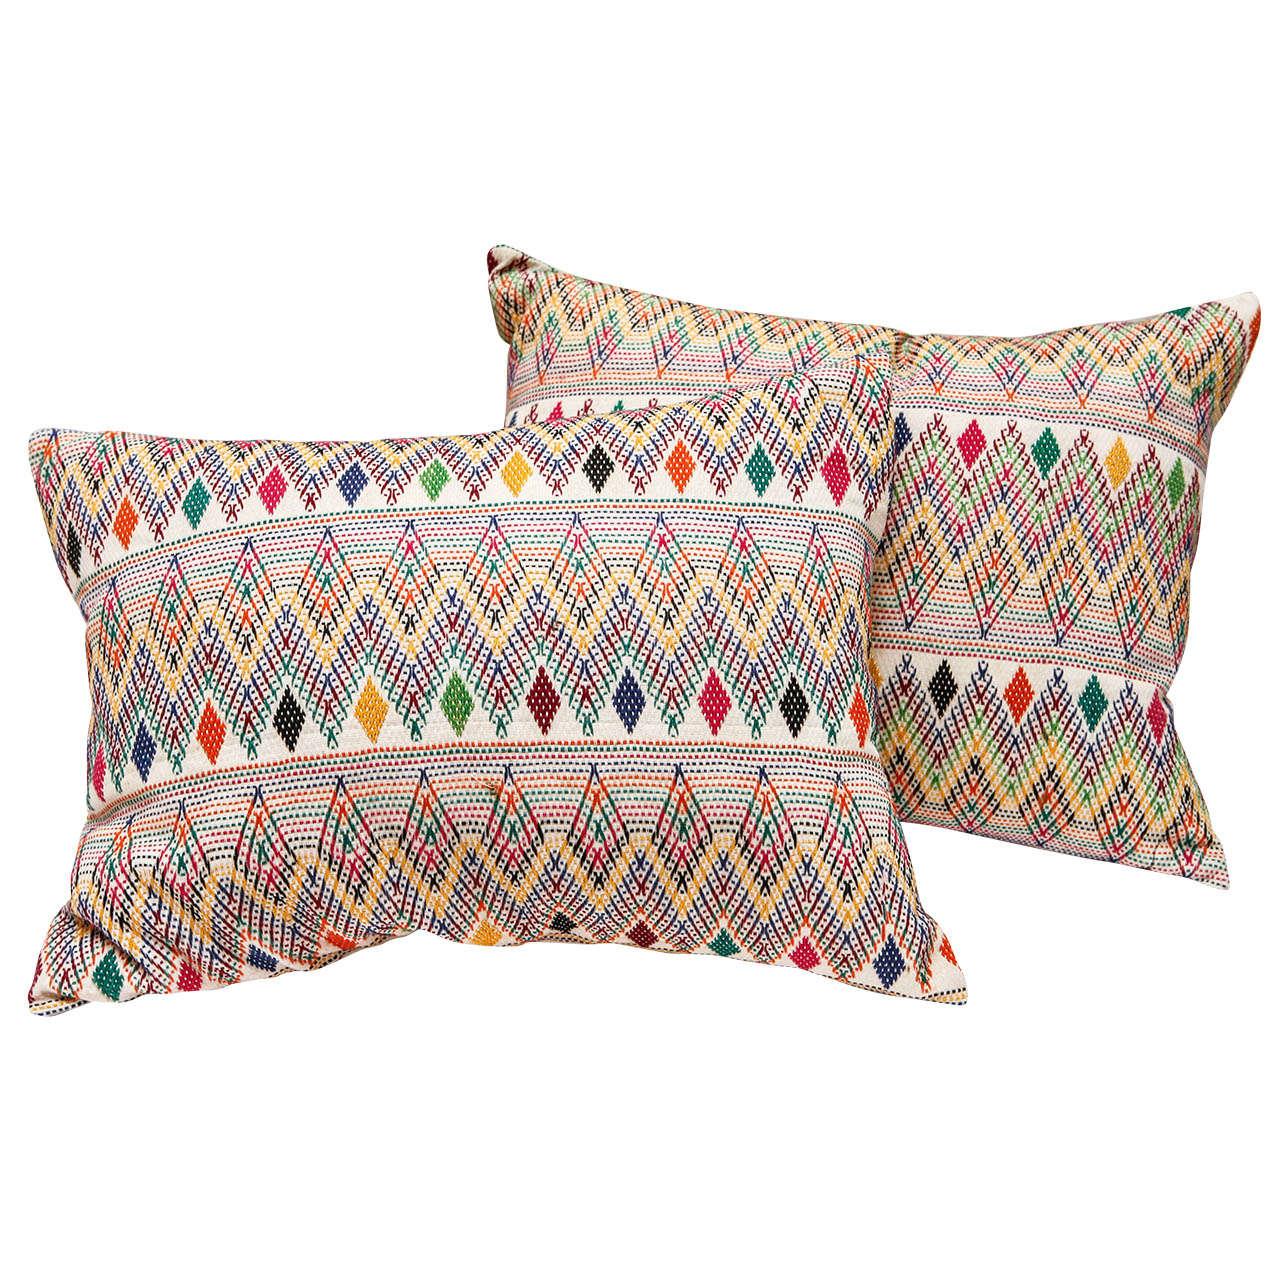 Gujarati Indian Needlework Pillows At 1stdibs